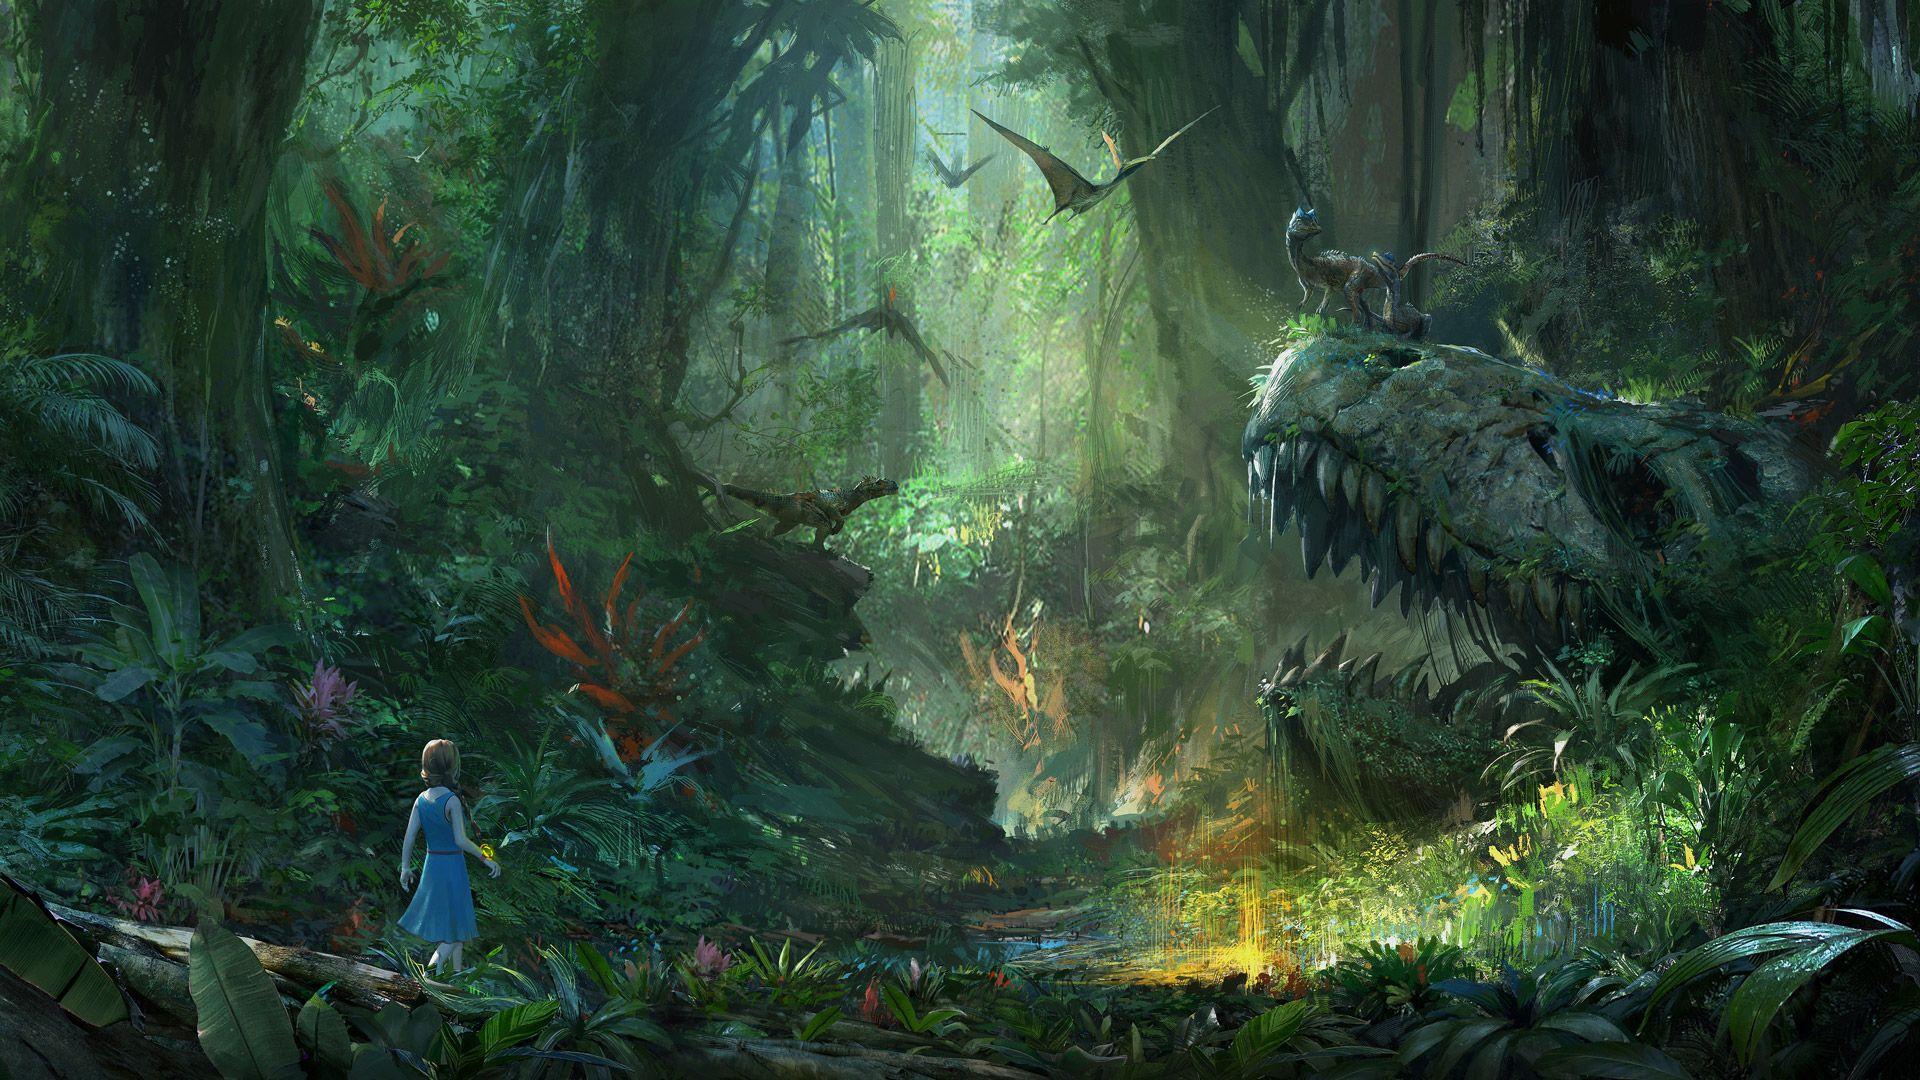 Related Image Evolve Wallpapers Ark Survival Evolved Forest Art